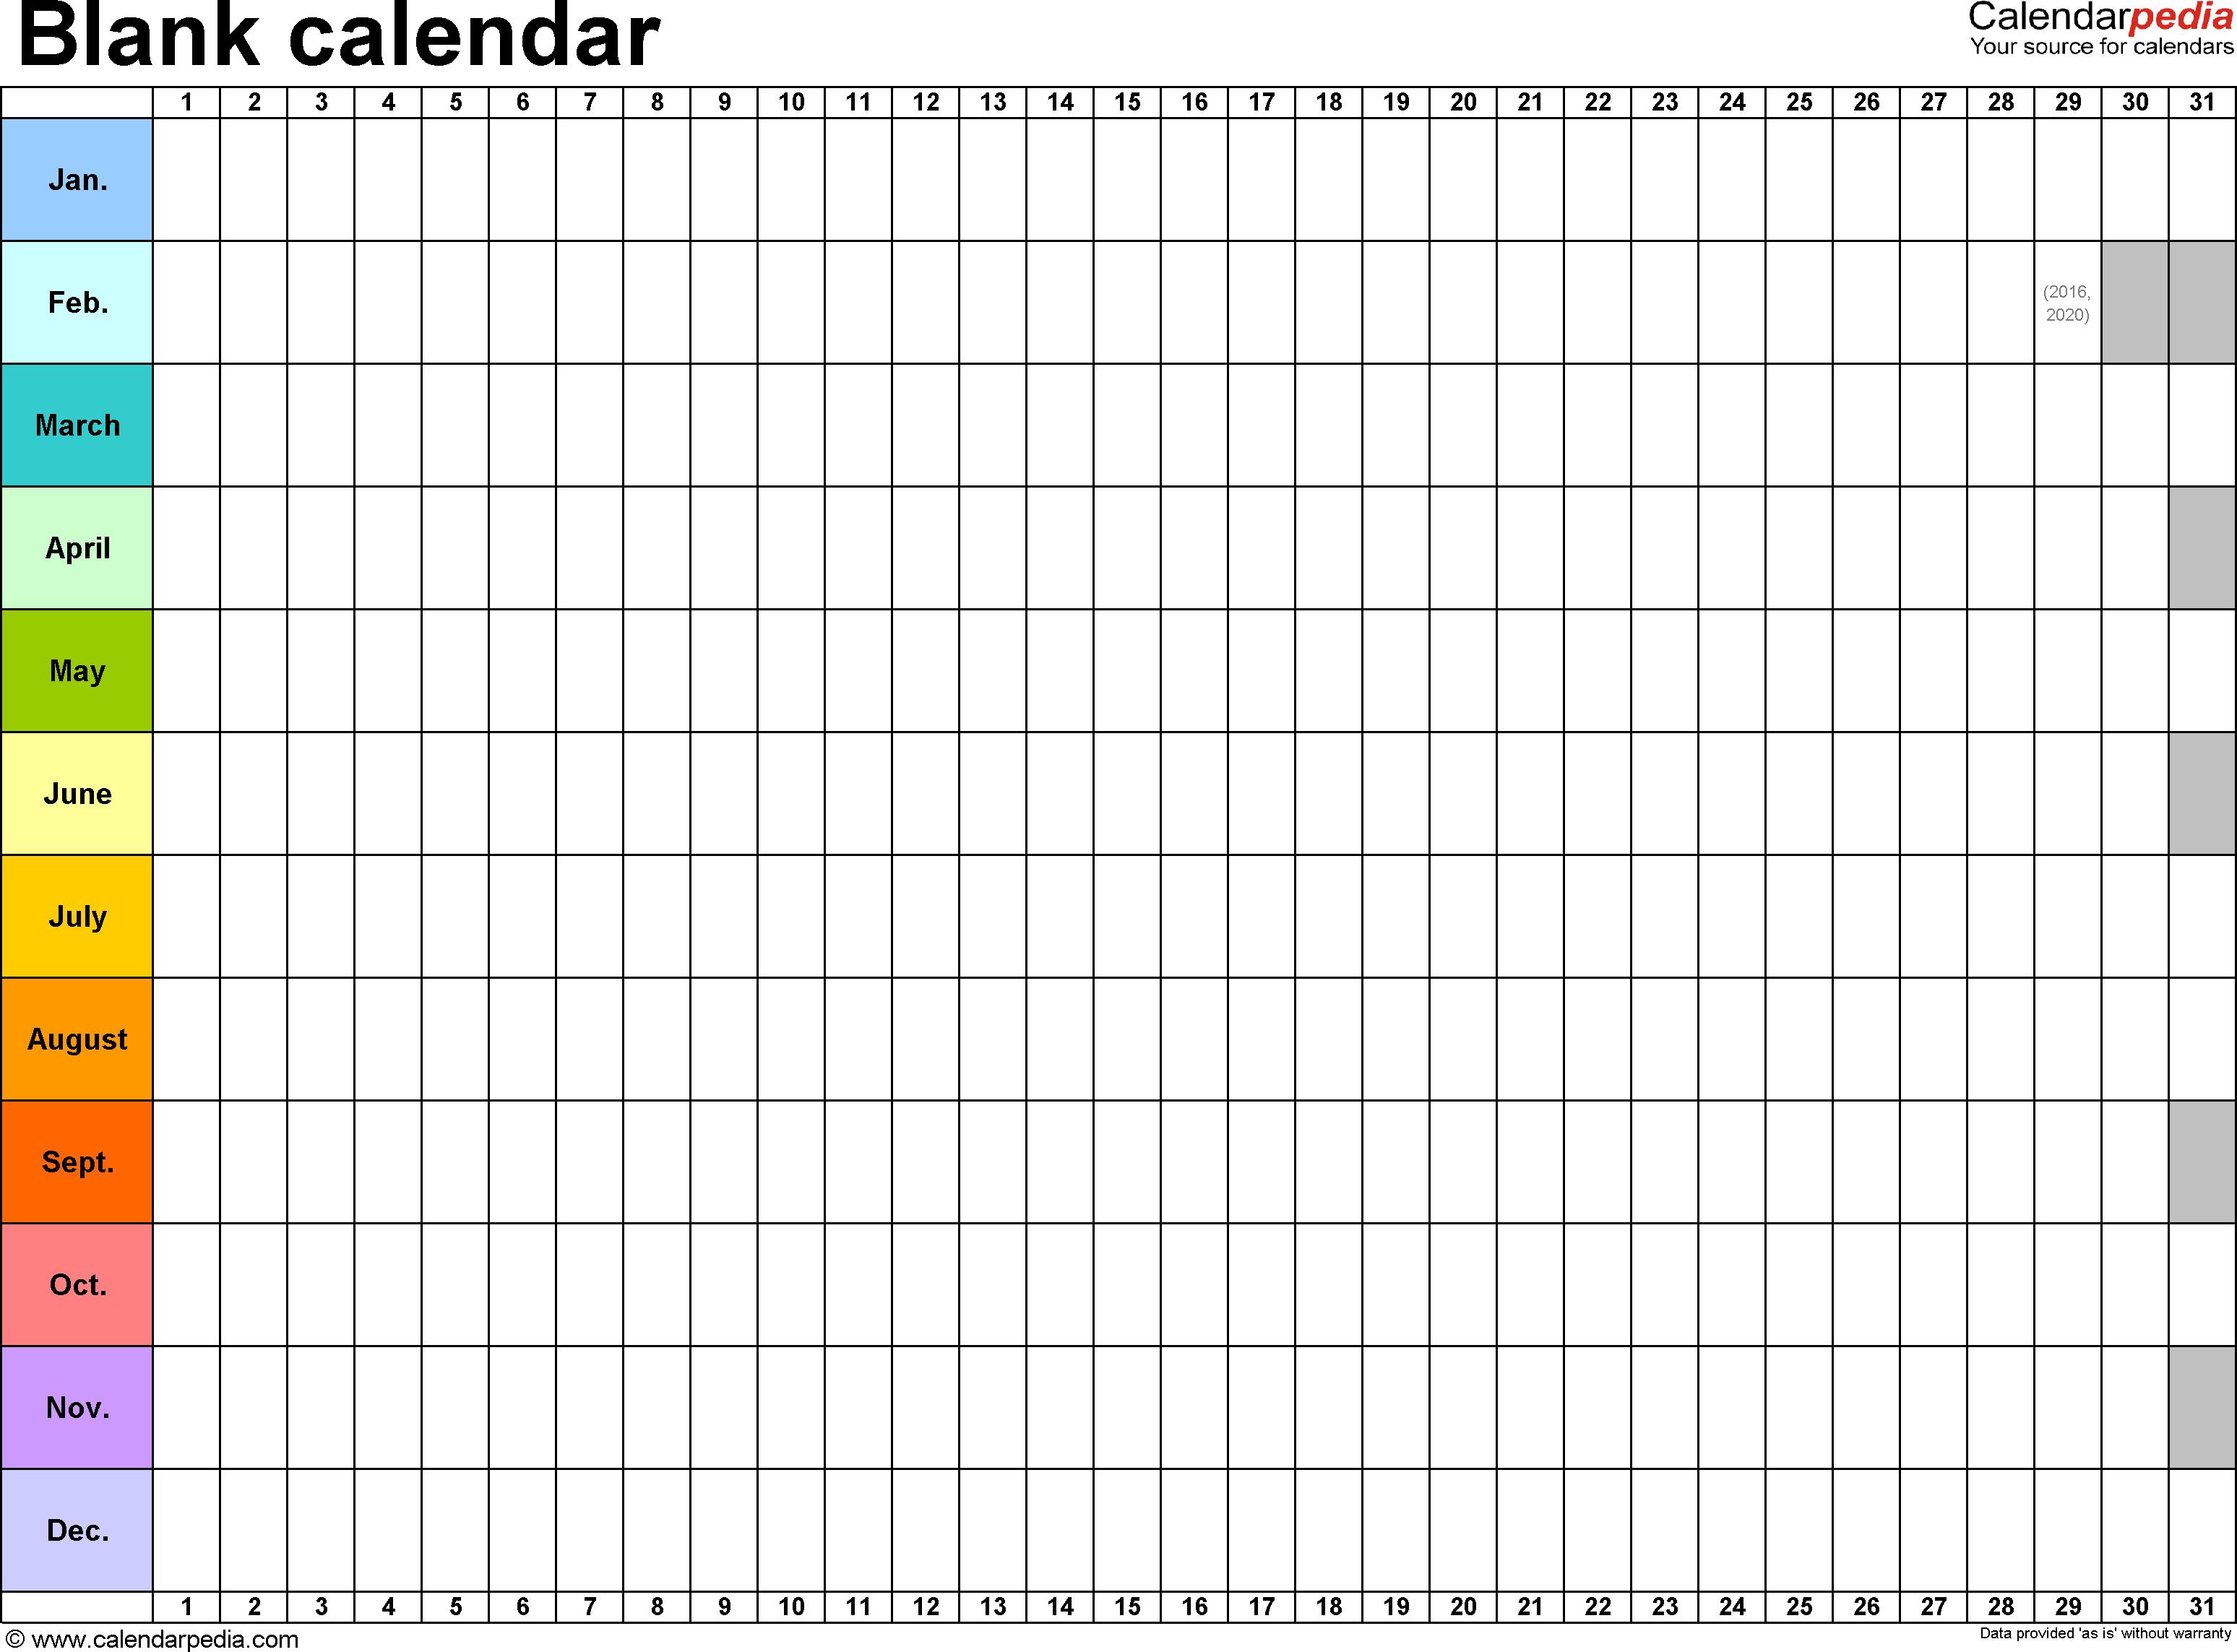 Blank Calendar - 9 Free Printable Microsoft Word Templates throughout 1 Month Calendar Printable Blank